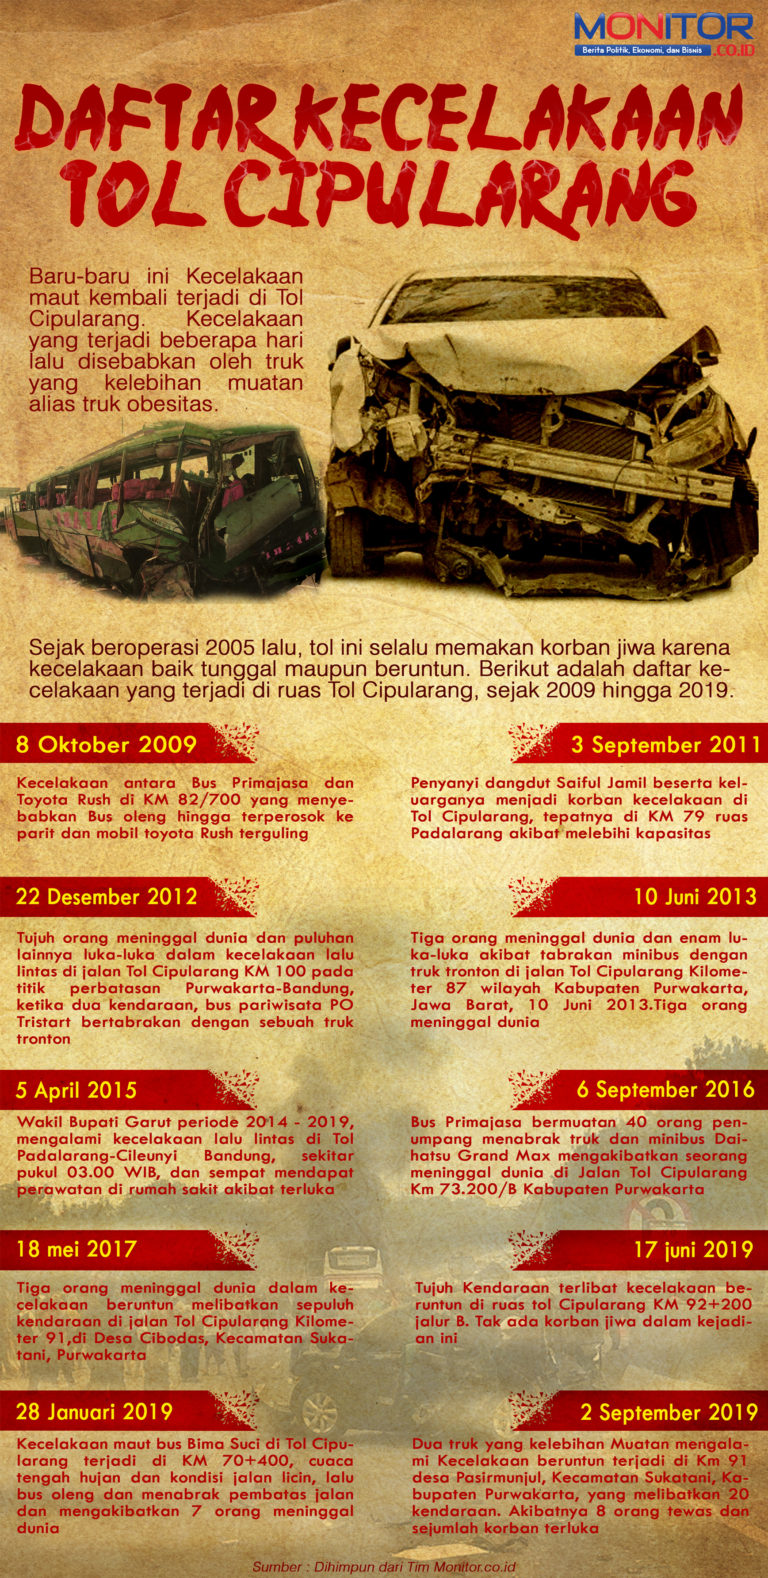 Daftar Kecelakaan Tol Cipularang